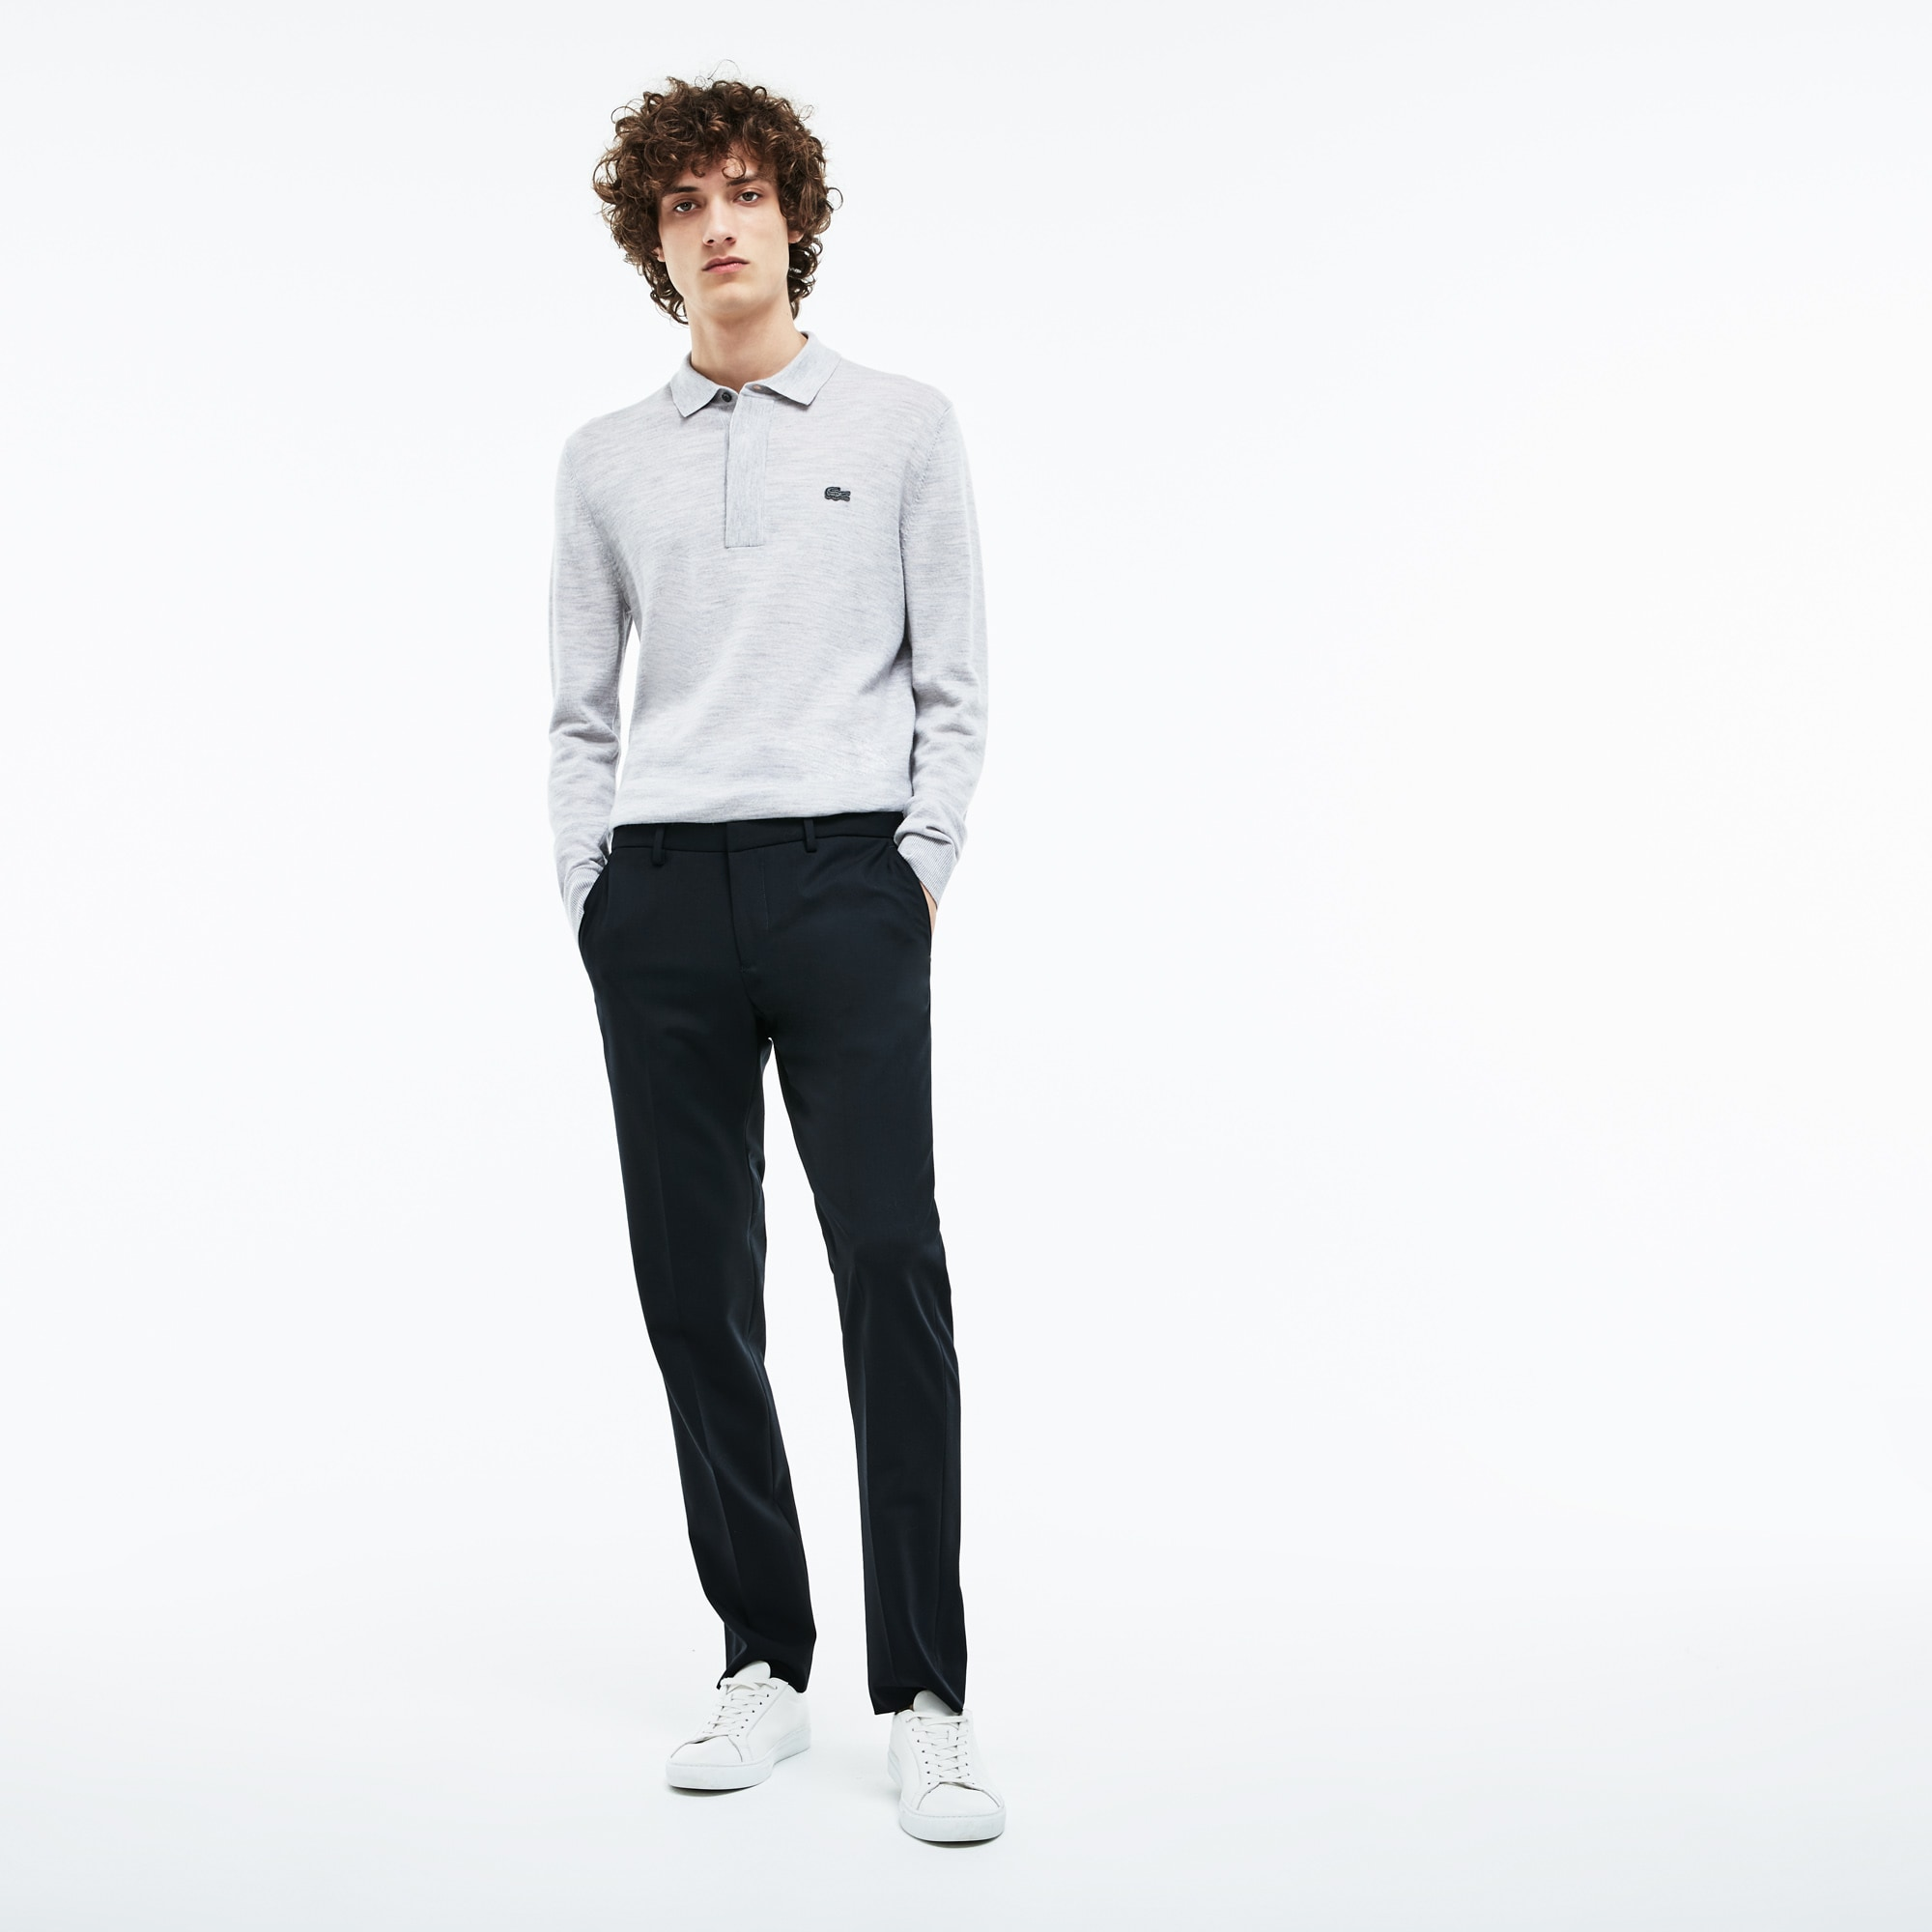 Pantaloni chino slim fit in twill stretch tinta unita